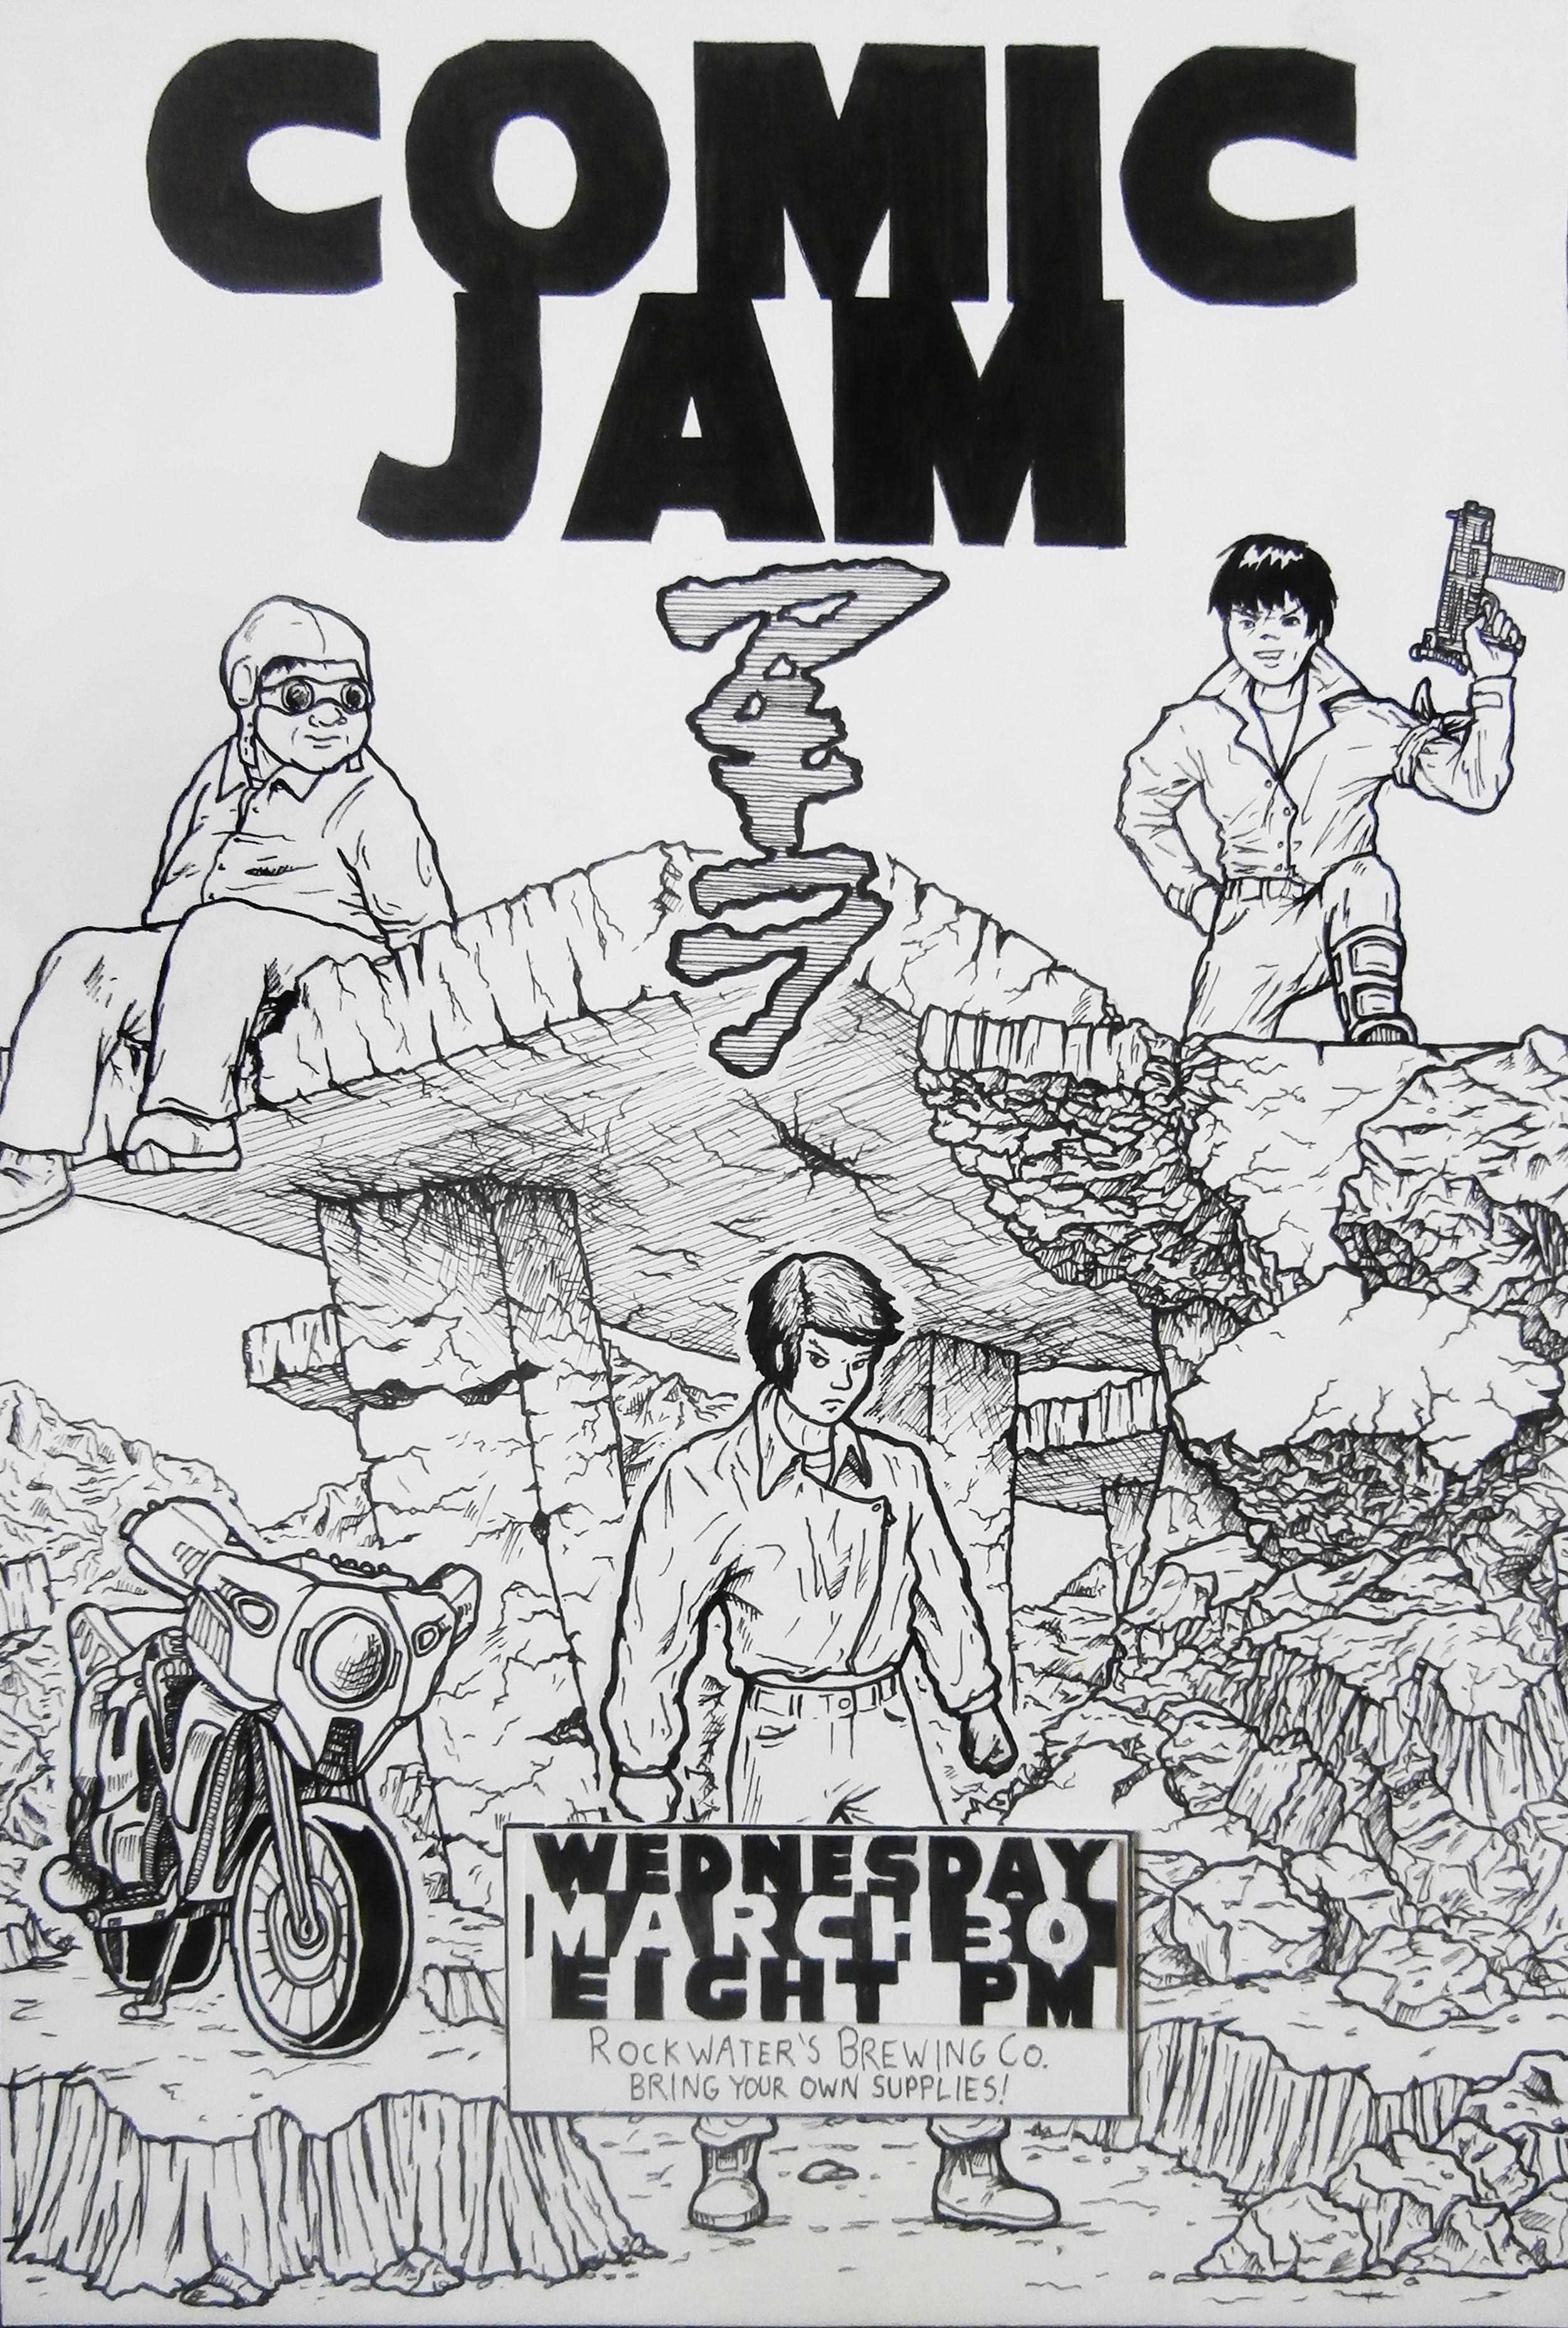 Comic Jam poster, 2004